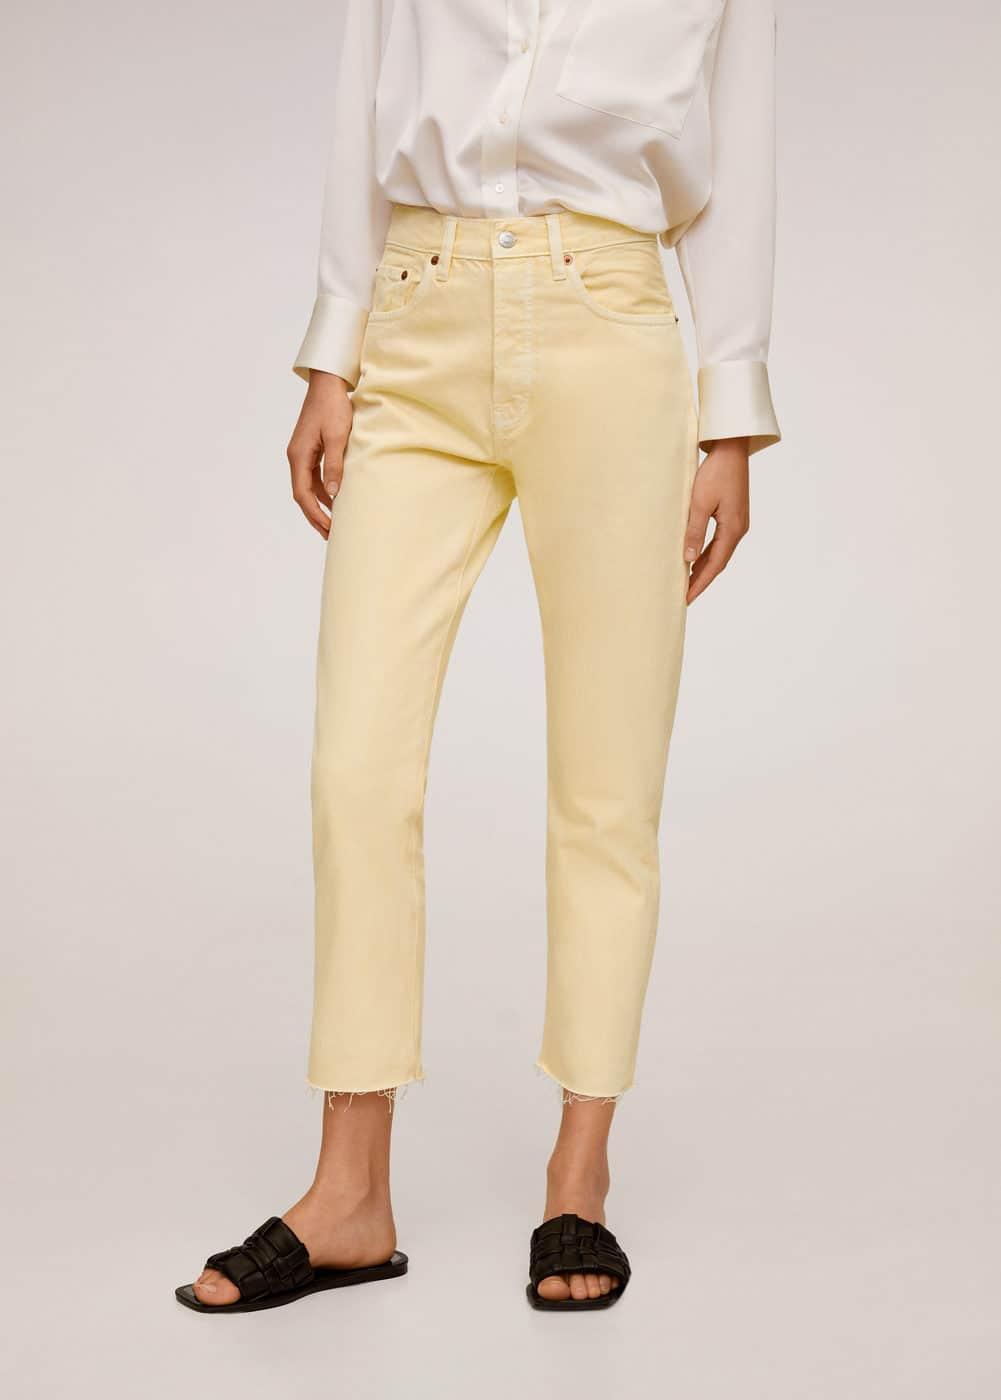 m-havana:jeans straight fit crop